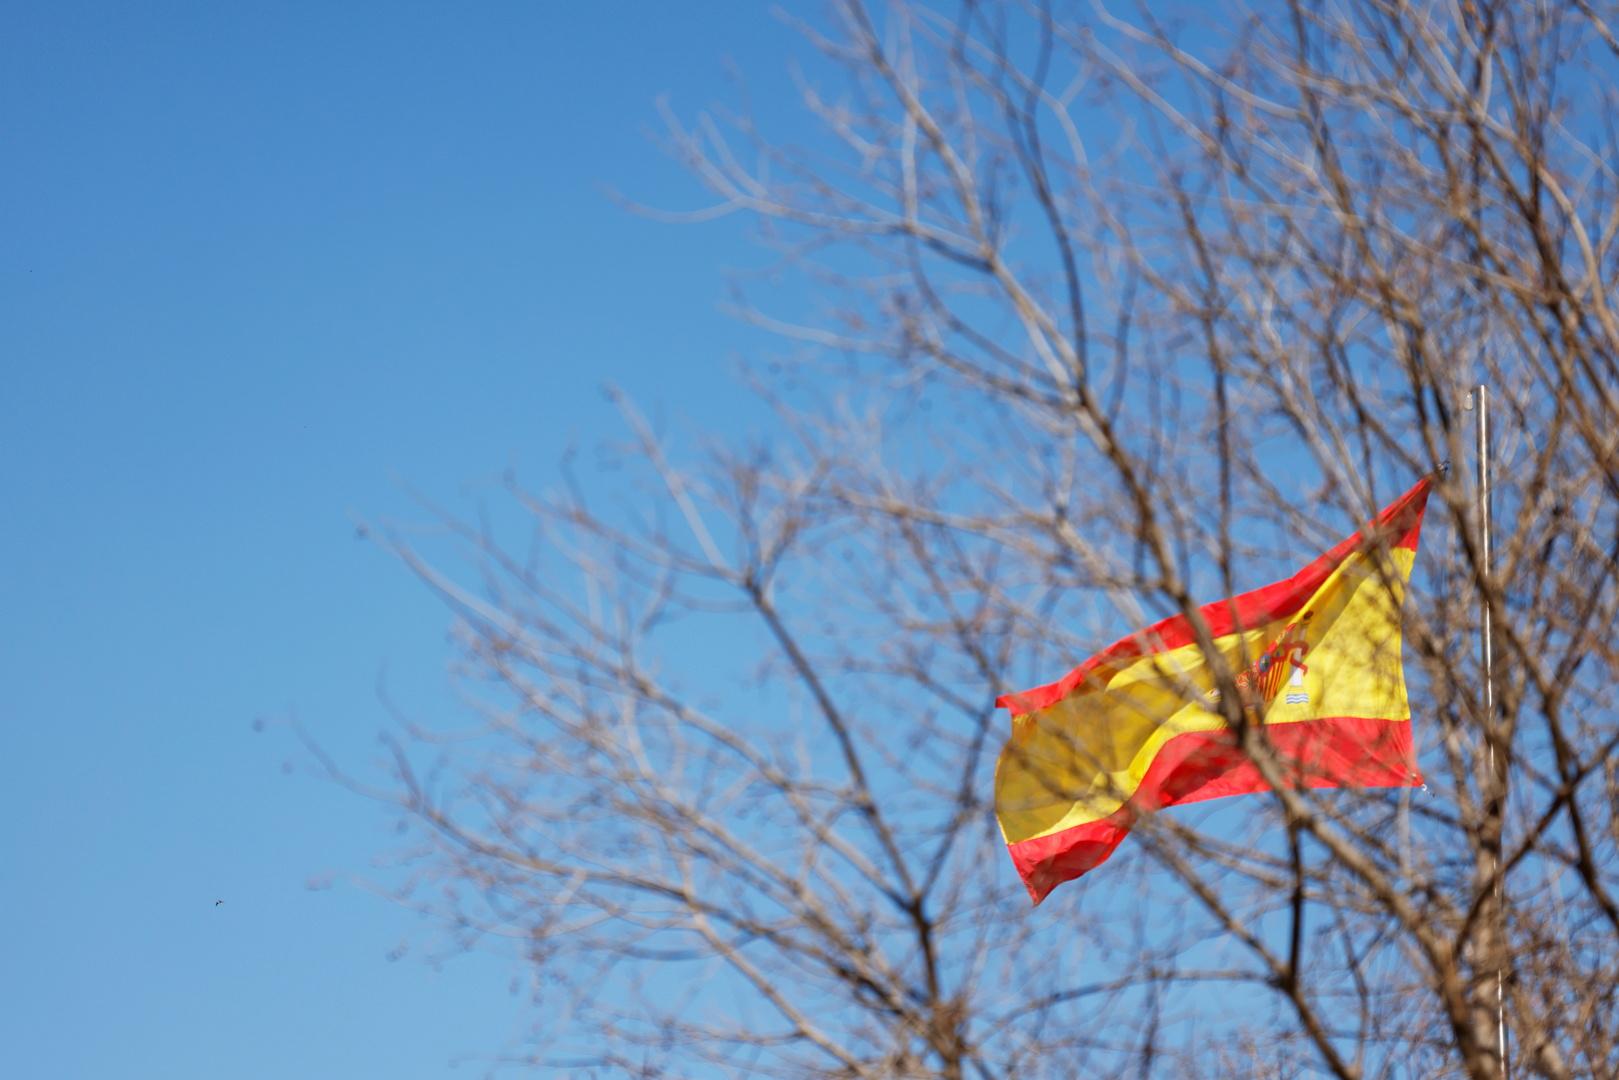 إسبانيا تعلن أنها ستشدد موقفها تجاه كوبا